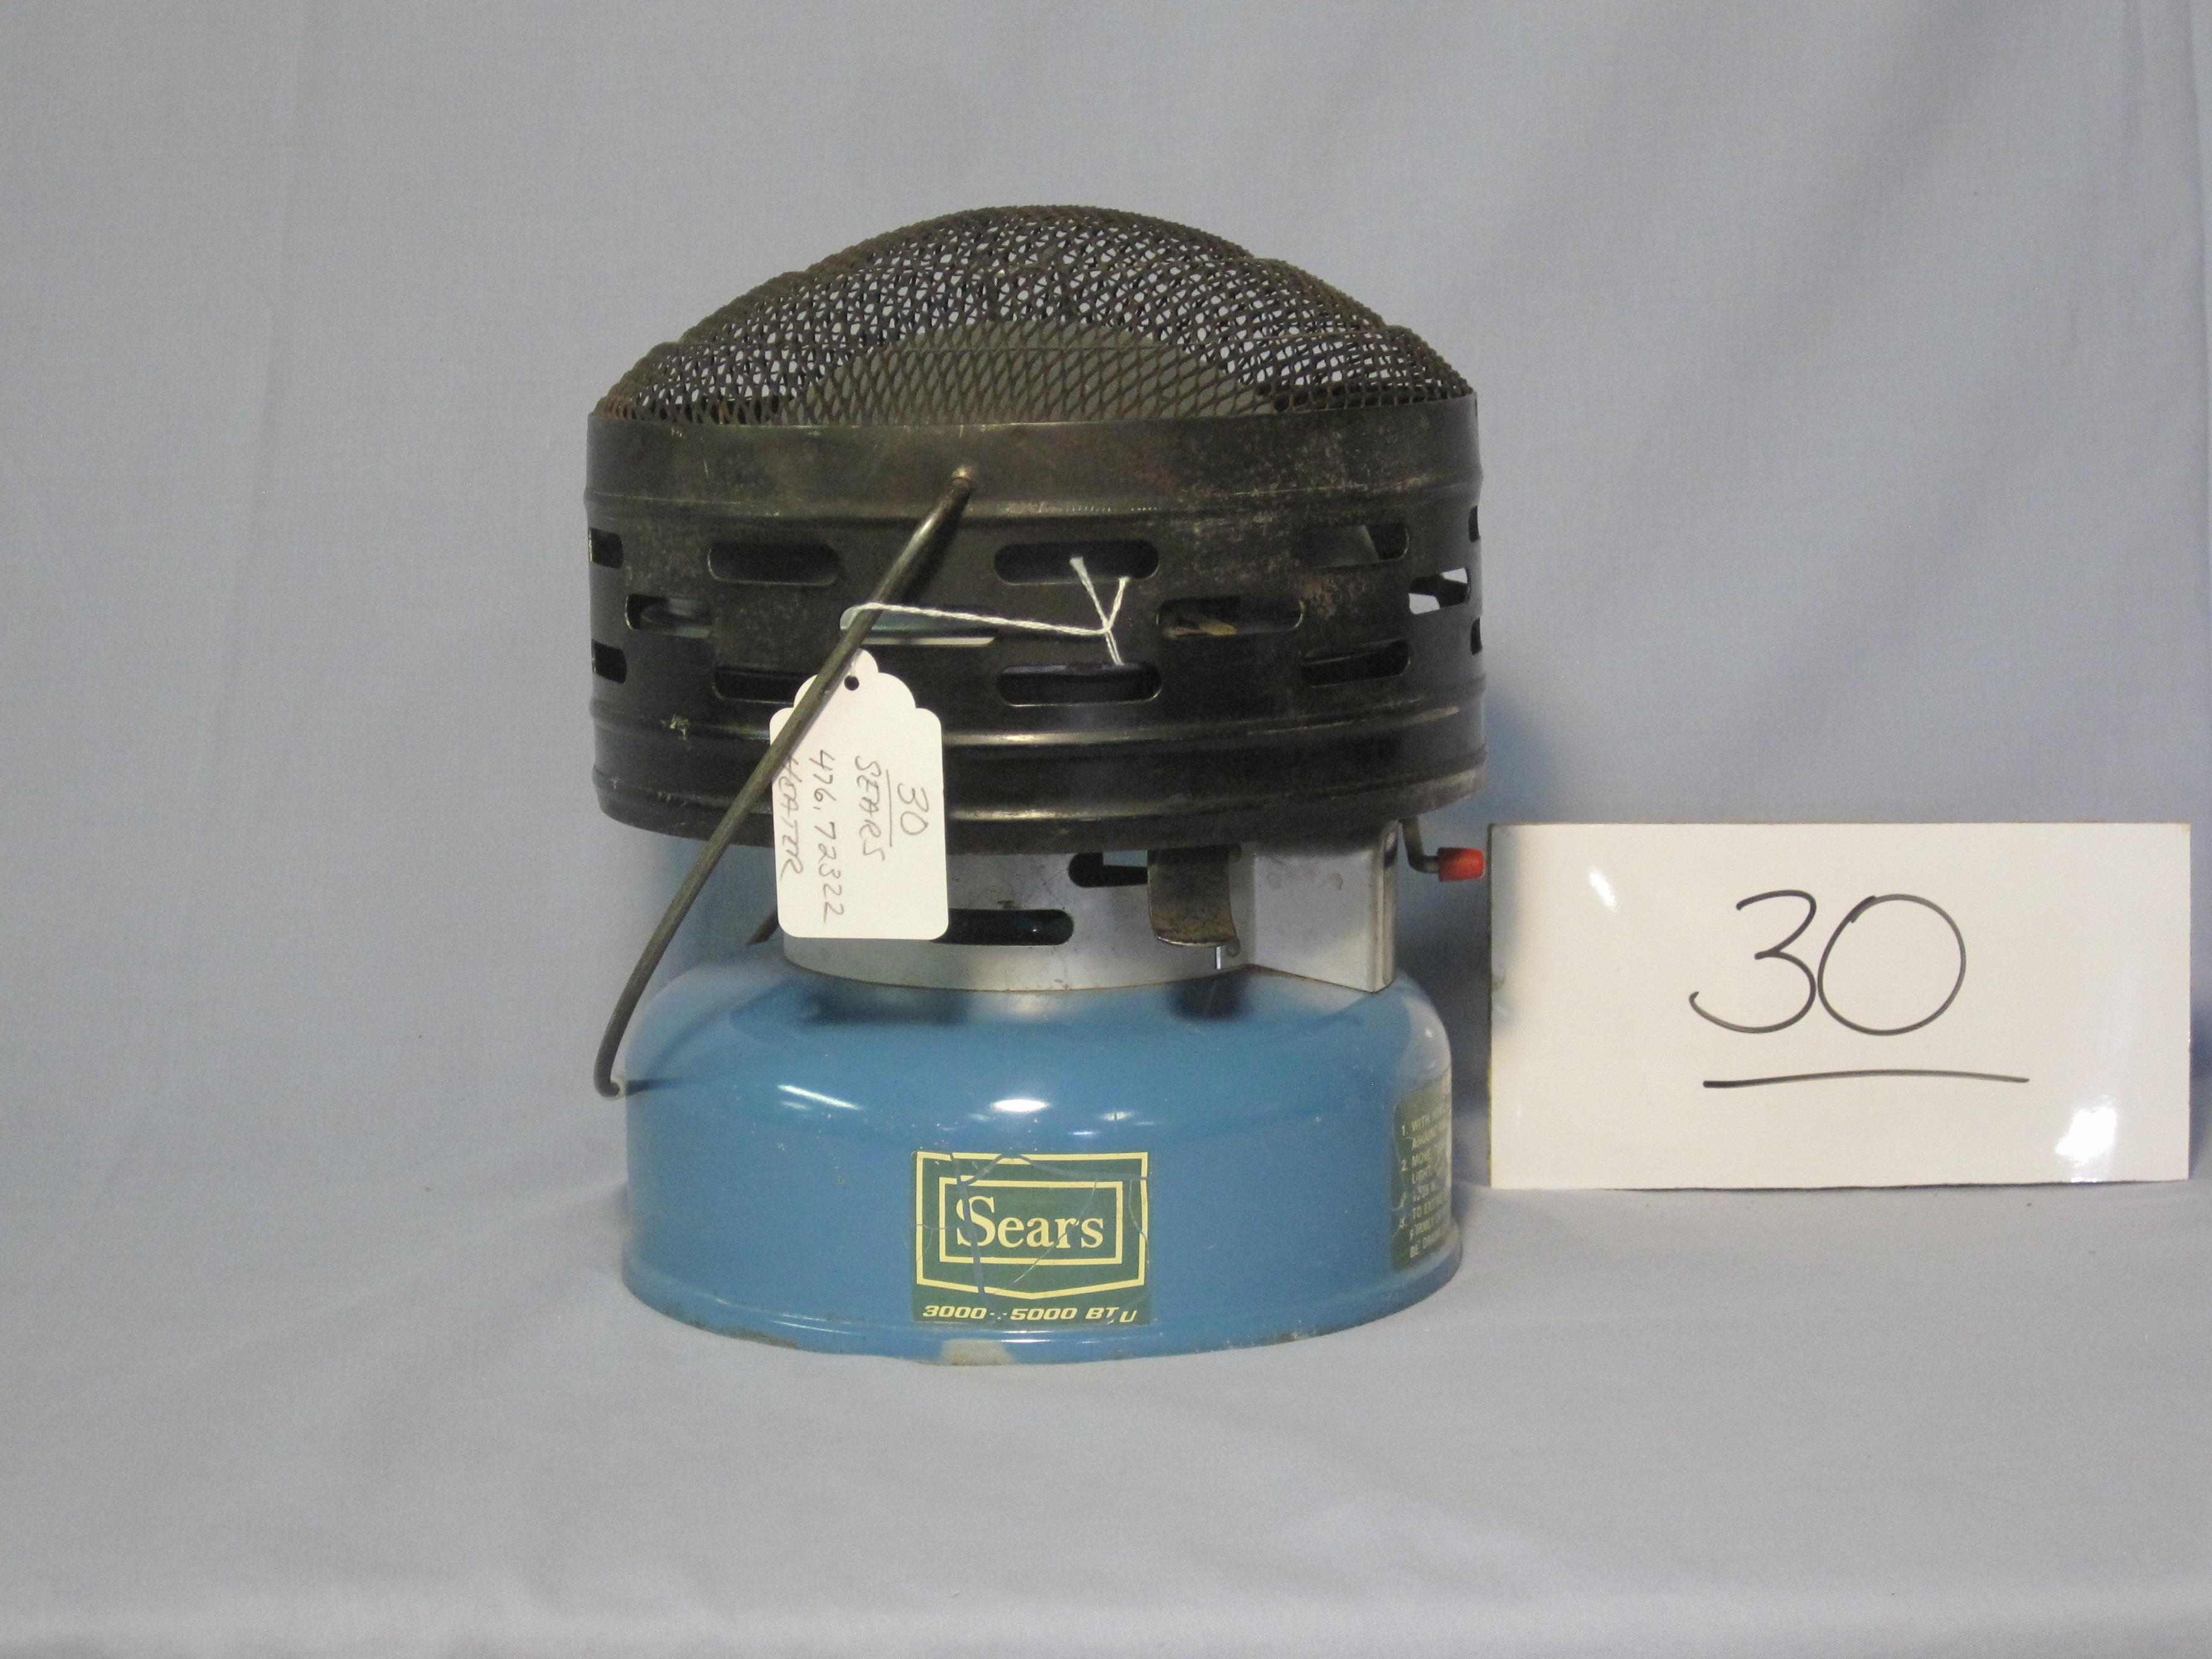 Coleman Sears catalytic heater